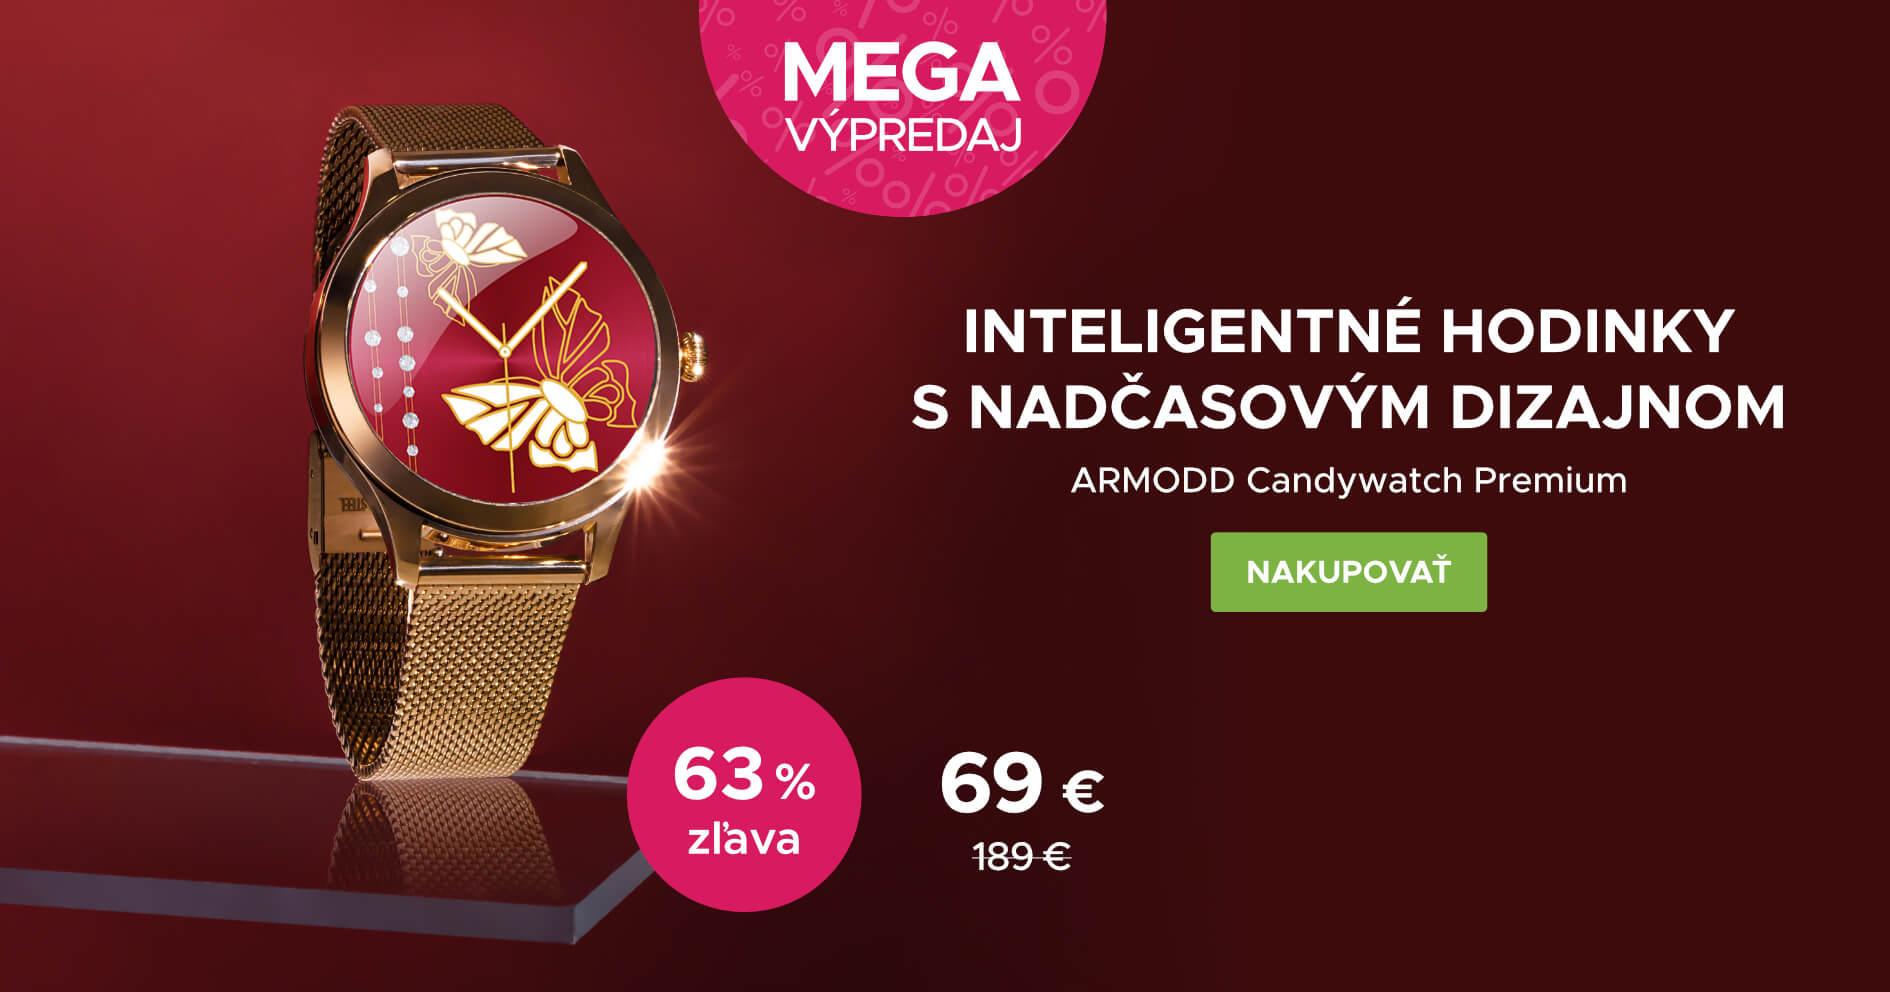 MEGA VÝPRODEJ: ARMODD Candywatch Premium zlatá